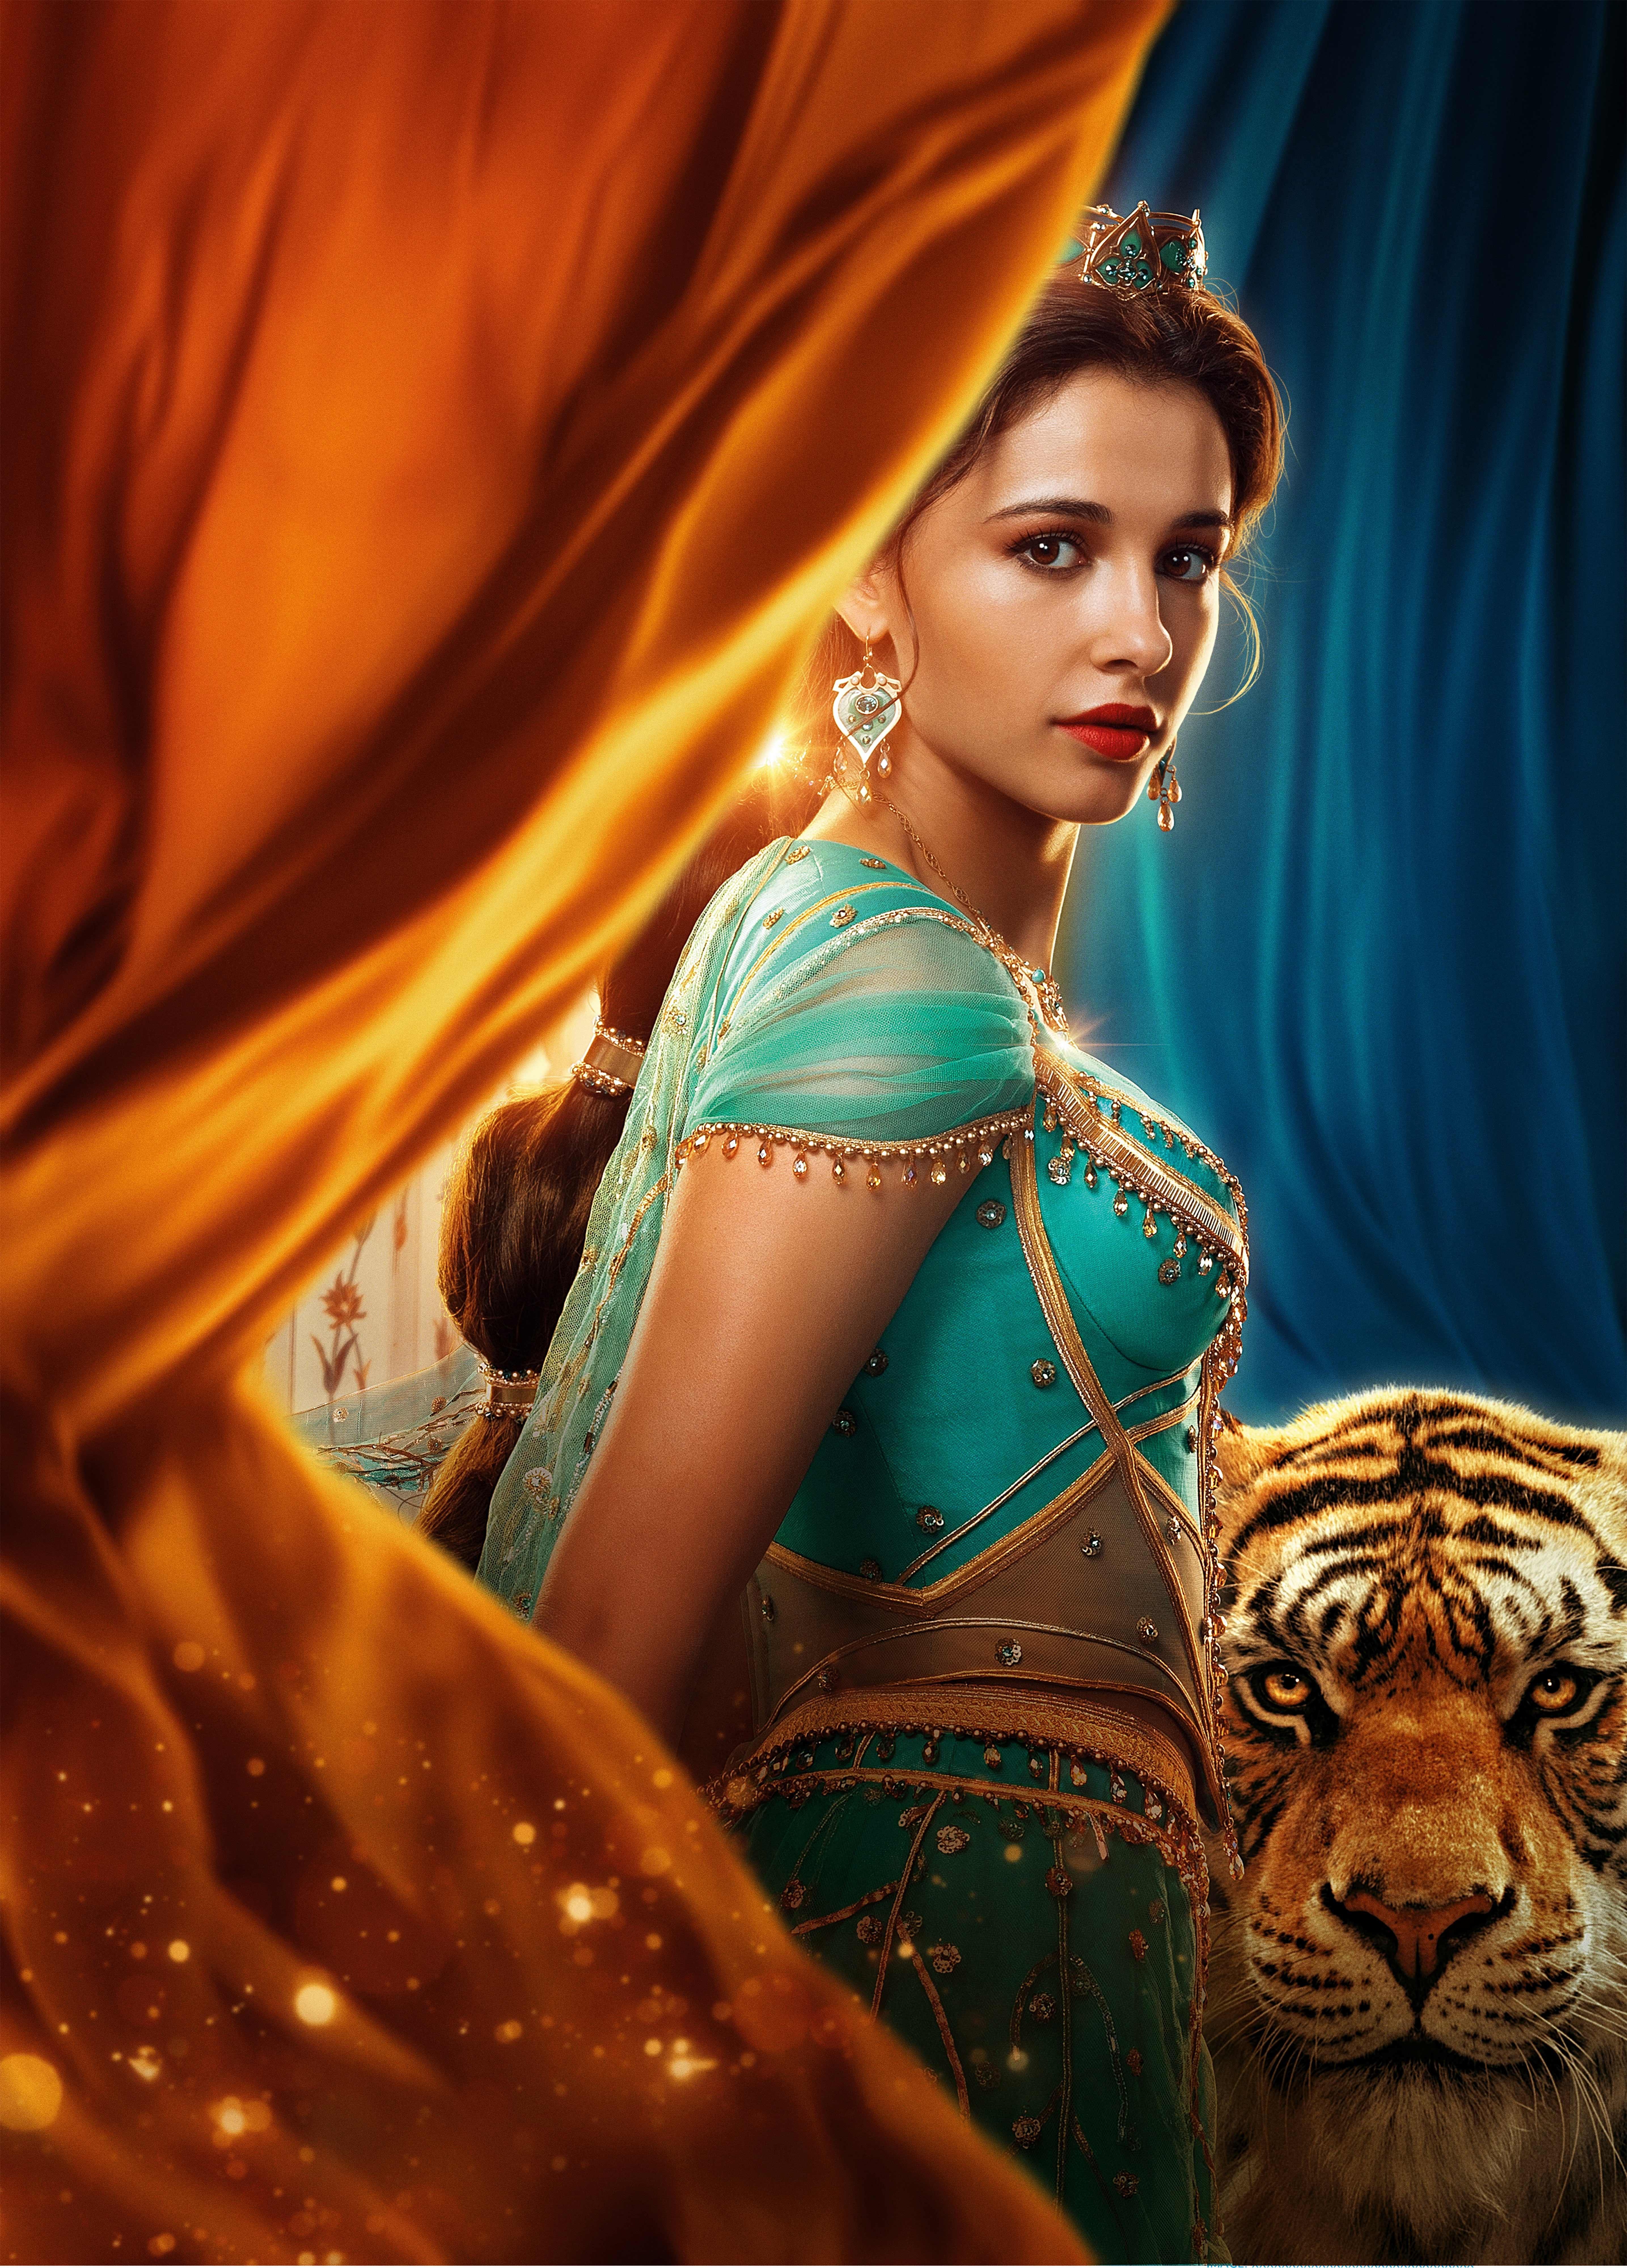 Princess Jasmine In Aladdin Movie 2019 Wallpaper Hd Movies